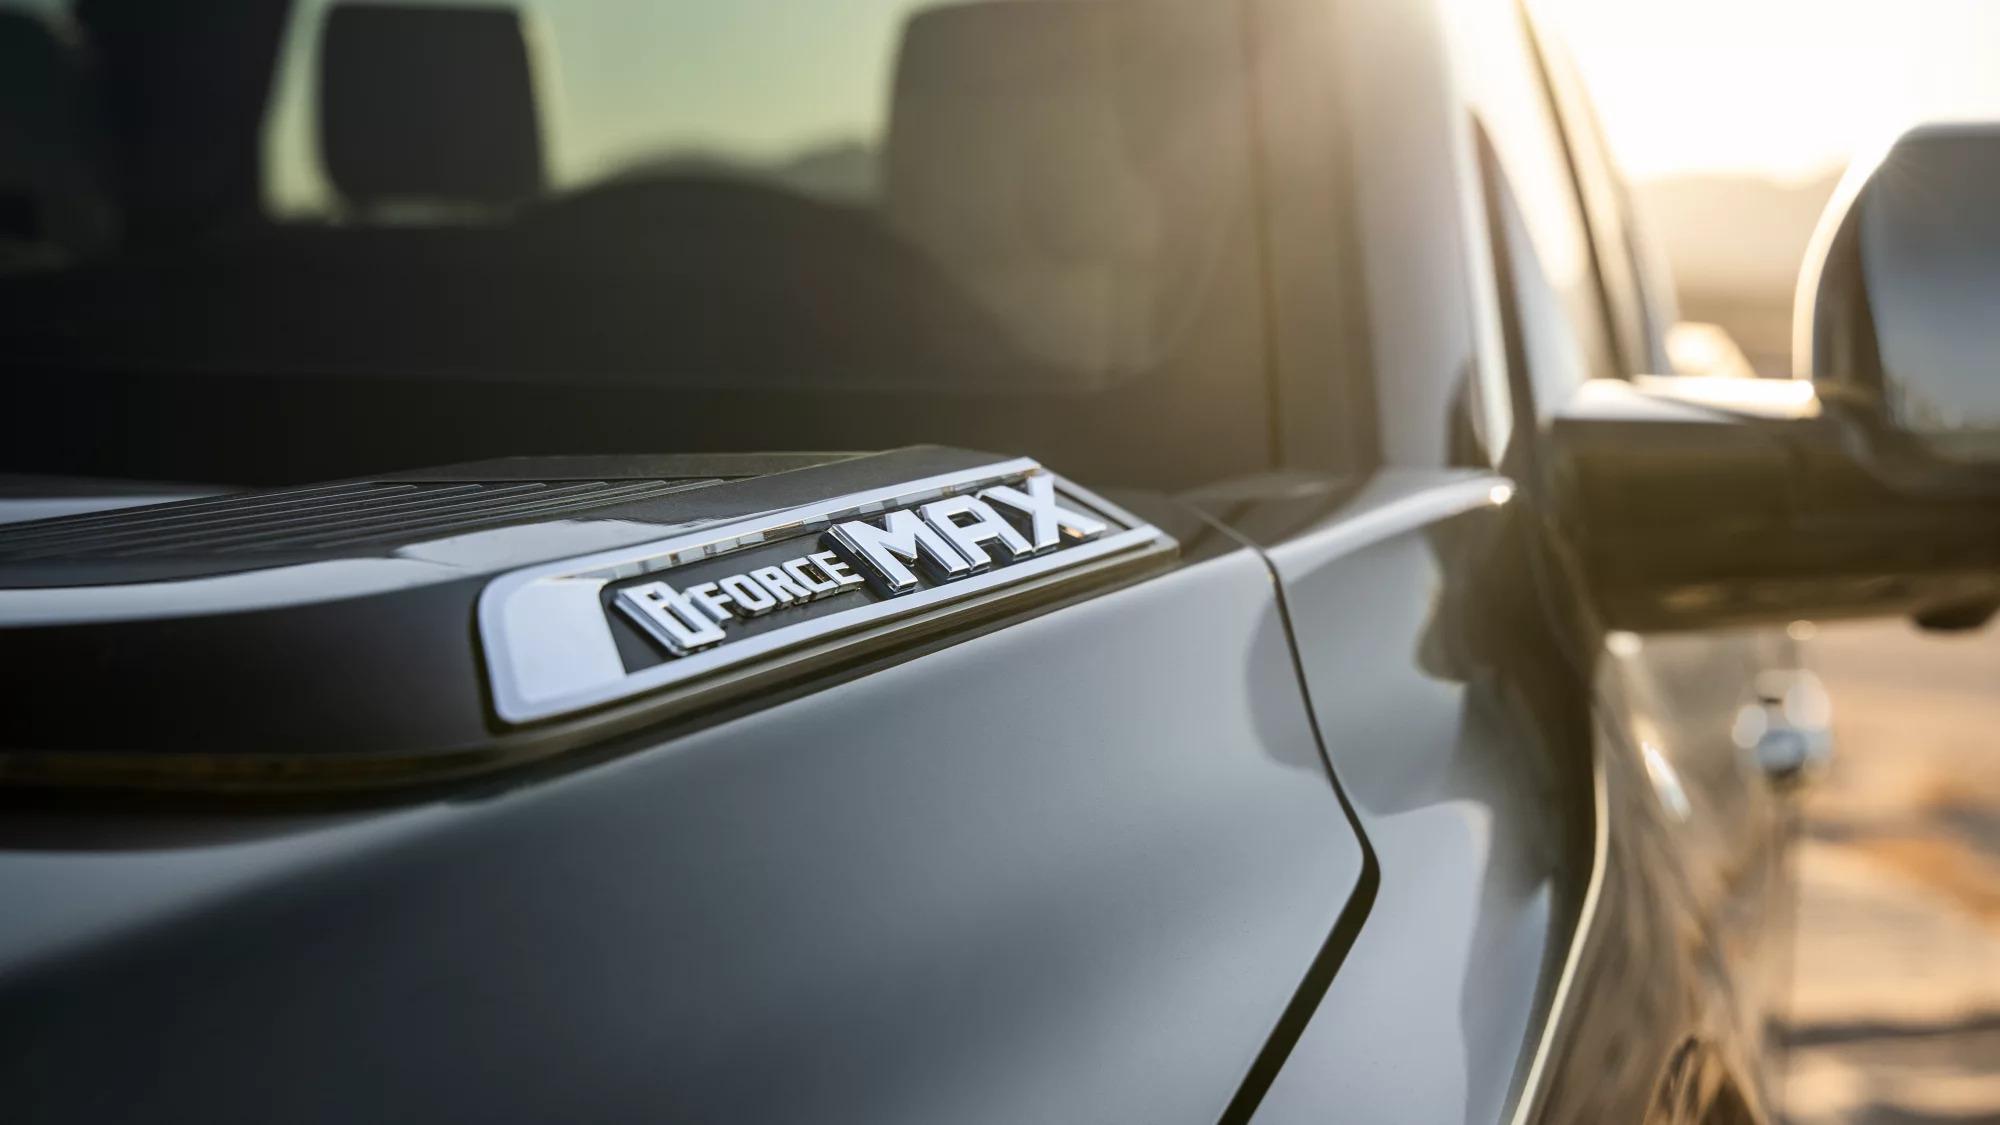 2022 Toyota Tundra i-FORCE MAX engine